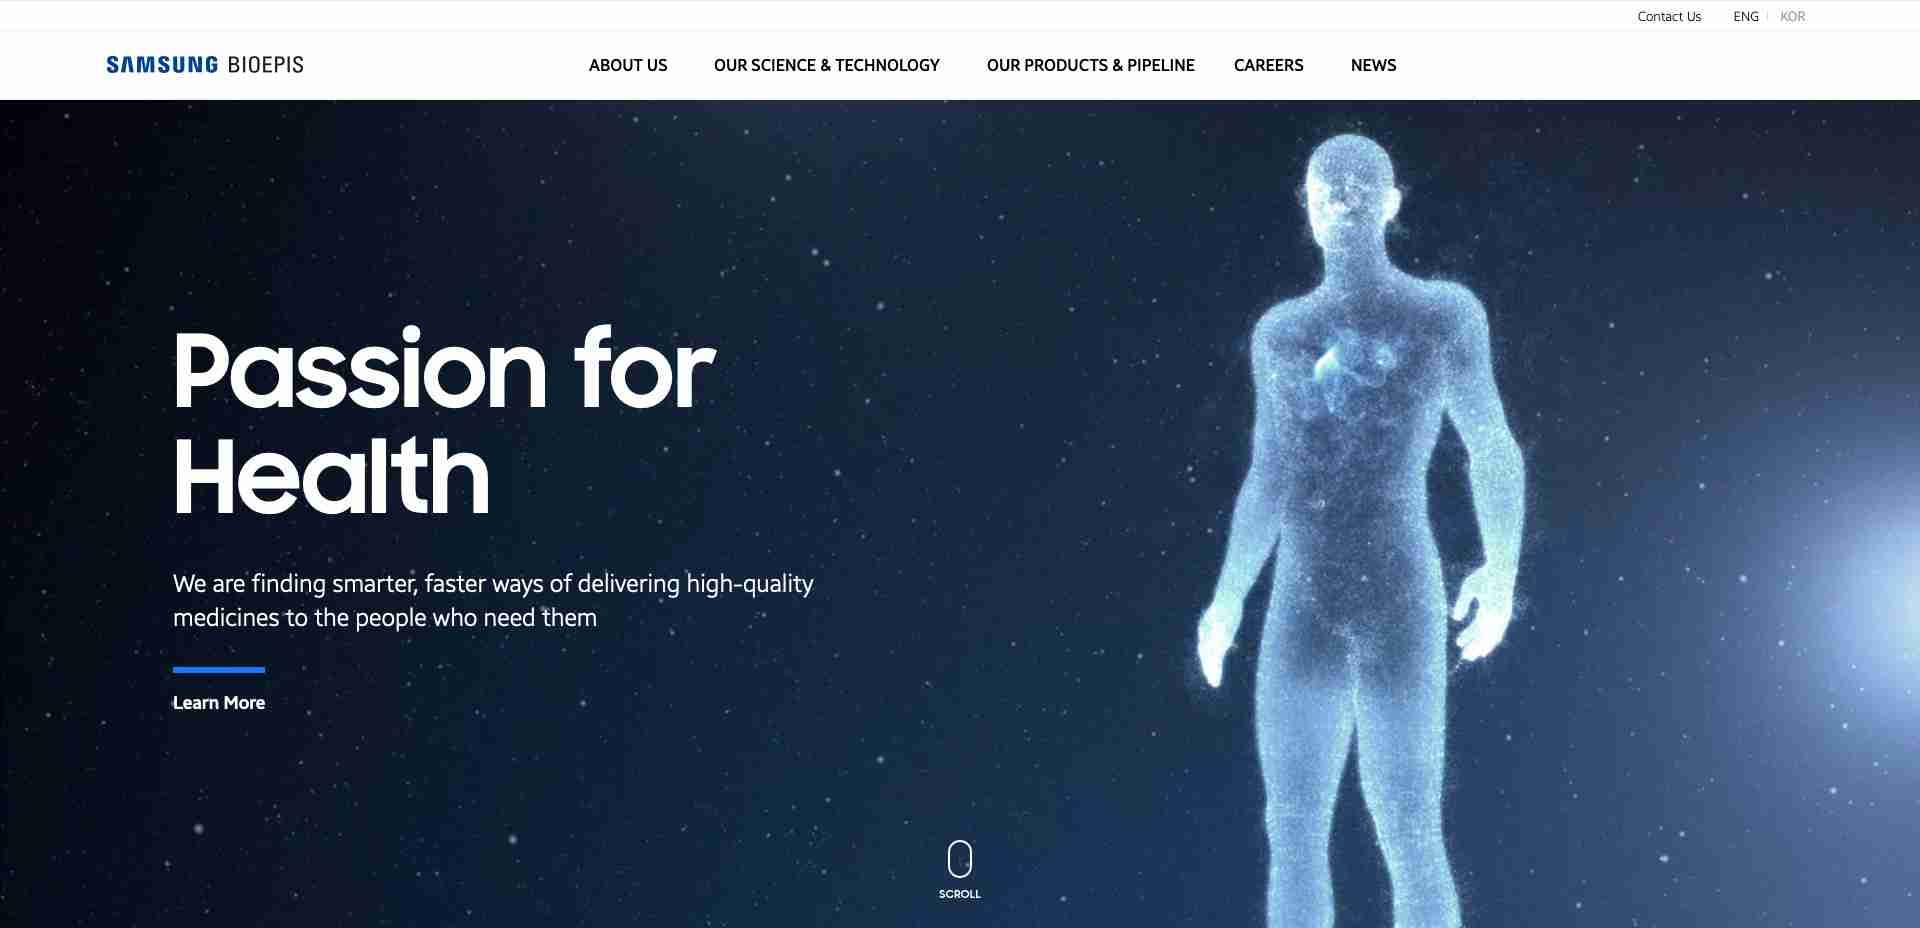 Samsung Bioepis Homepage